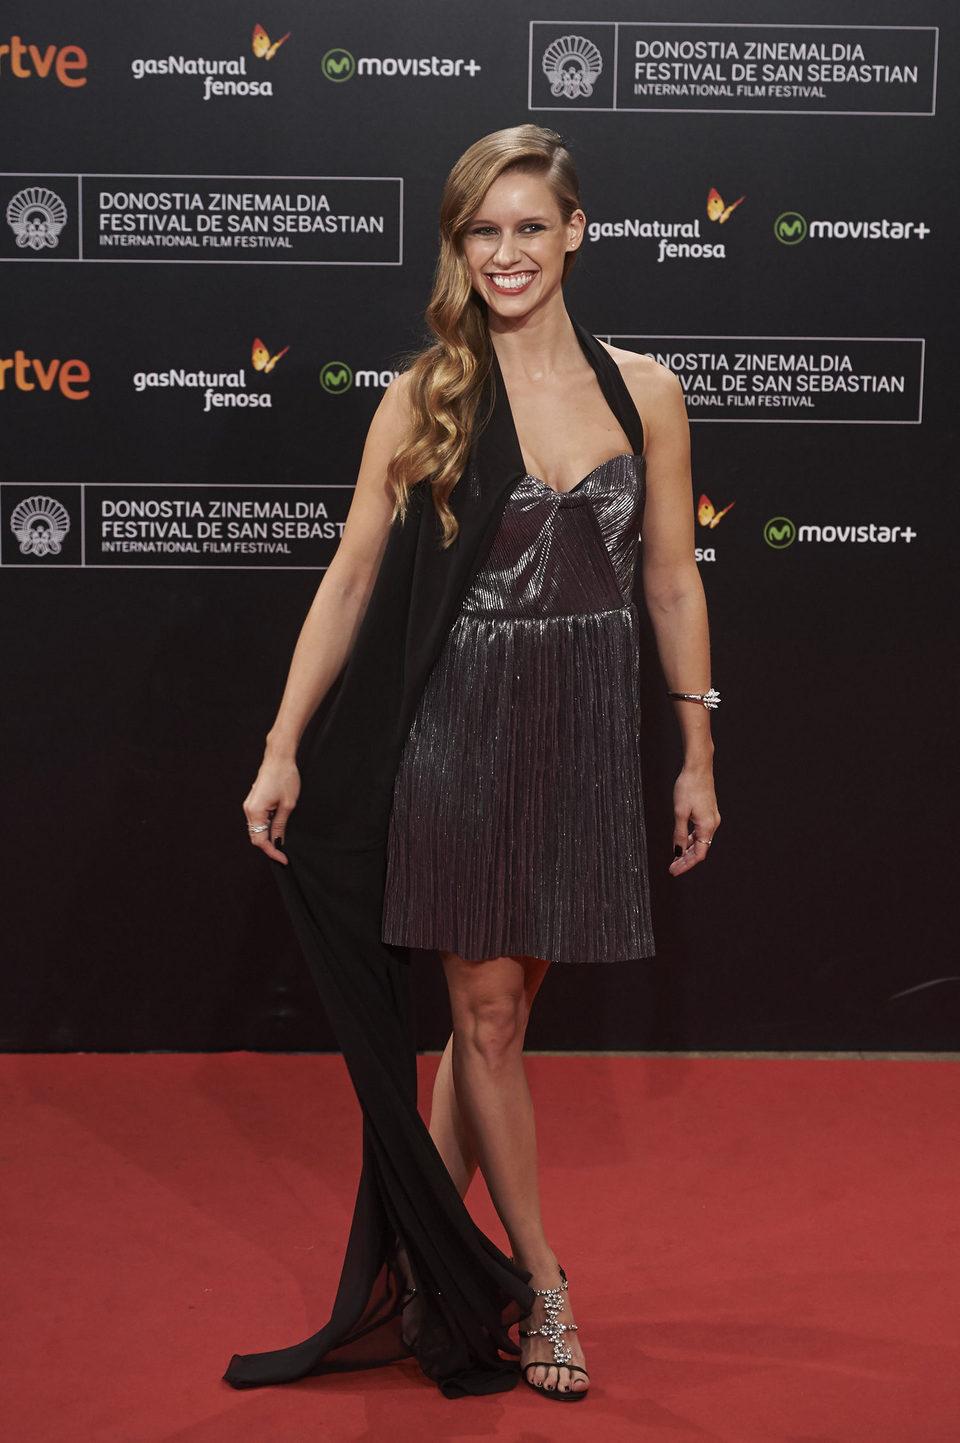 Spanish actress Manuela Velles attends the closing ceremony red carpet of the 63rd San Sebastian International Film Festival